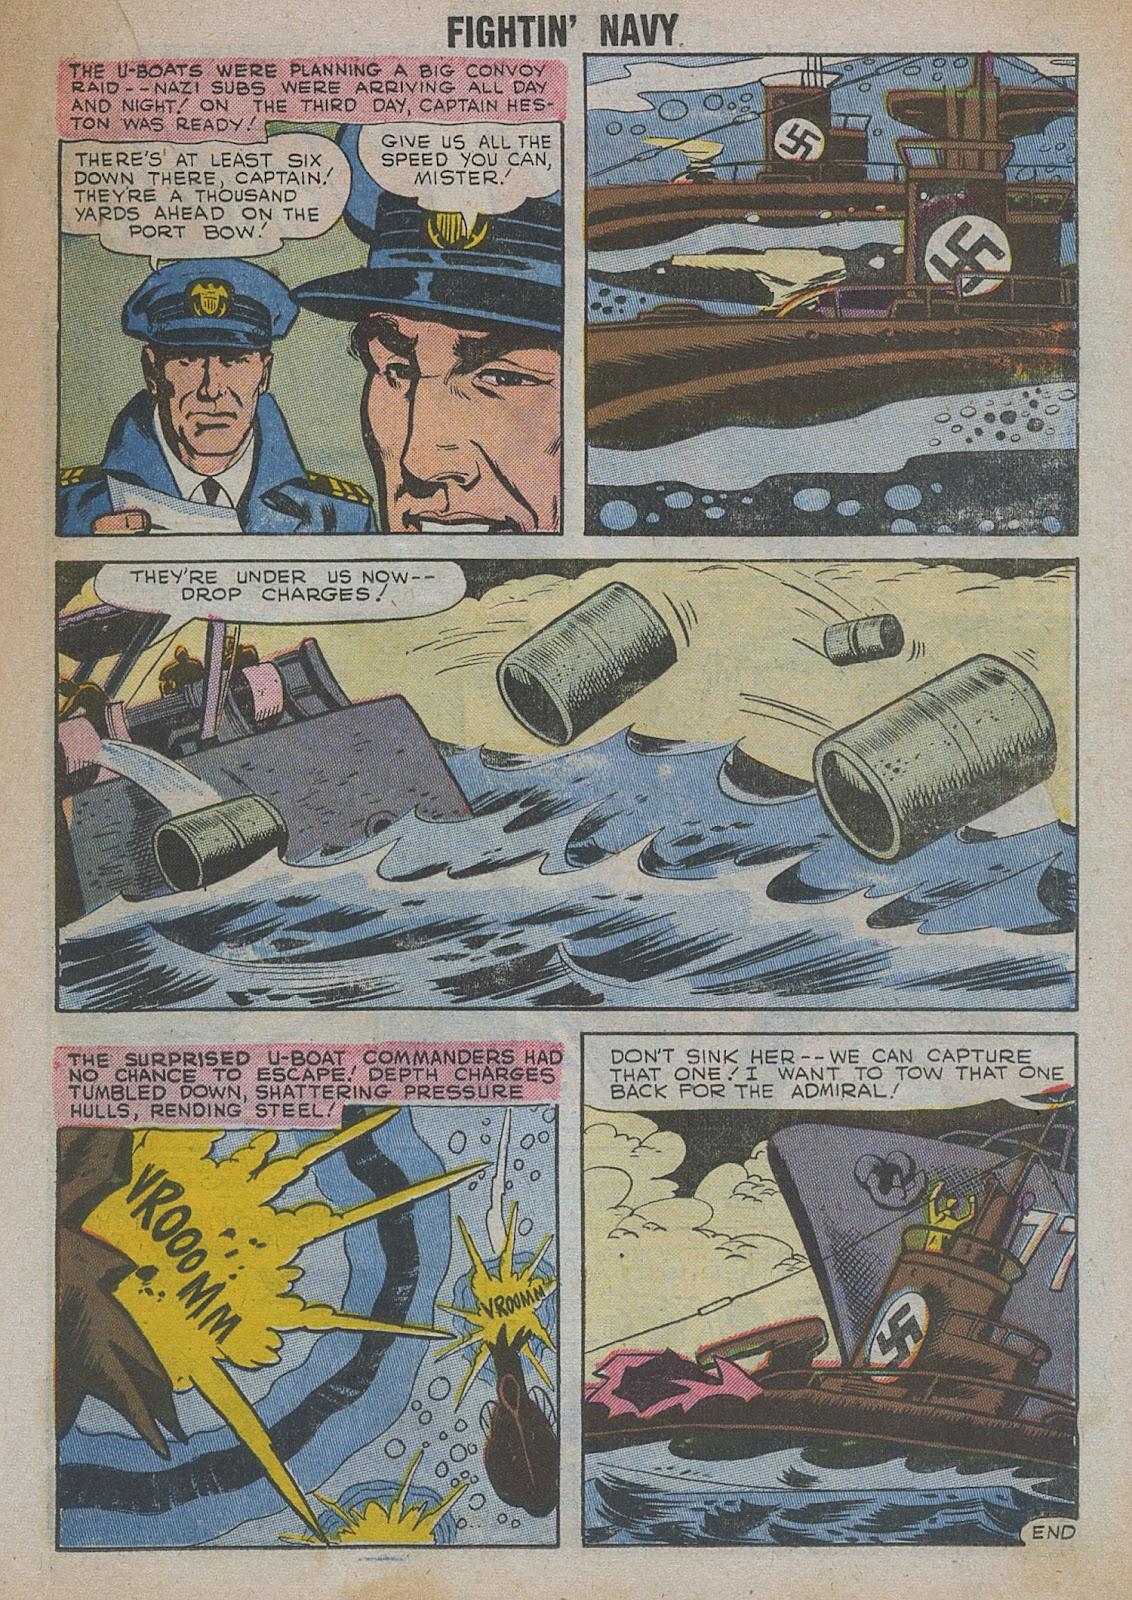 Read online Fightin' Navy comic -  Issue #82 - 37